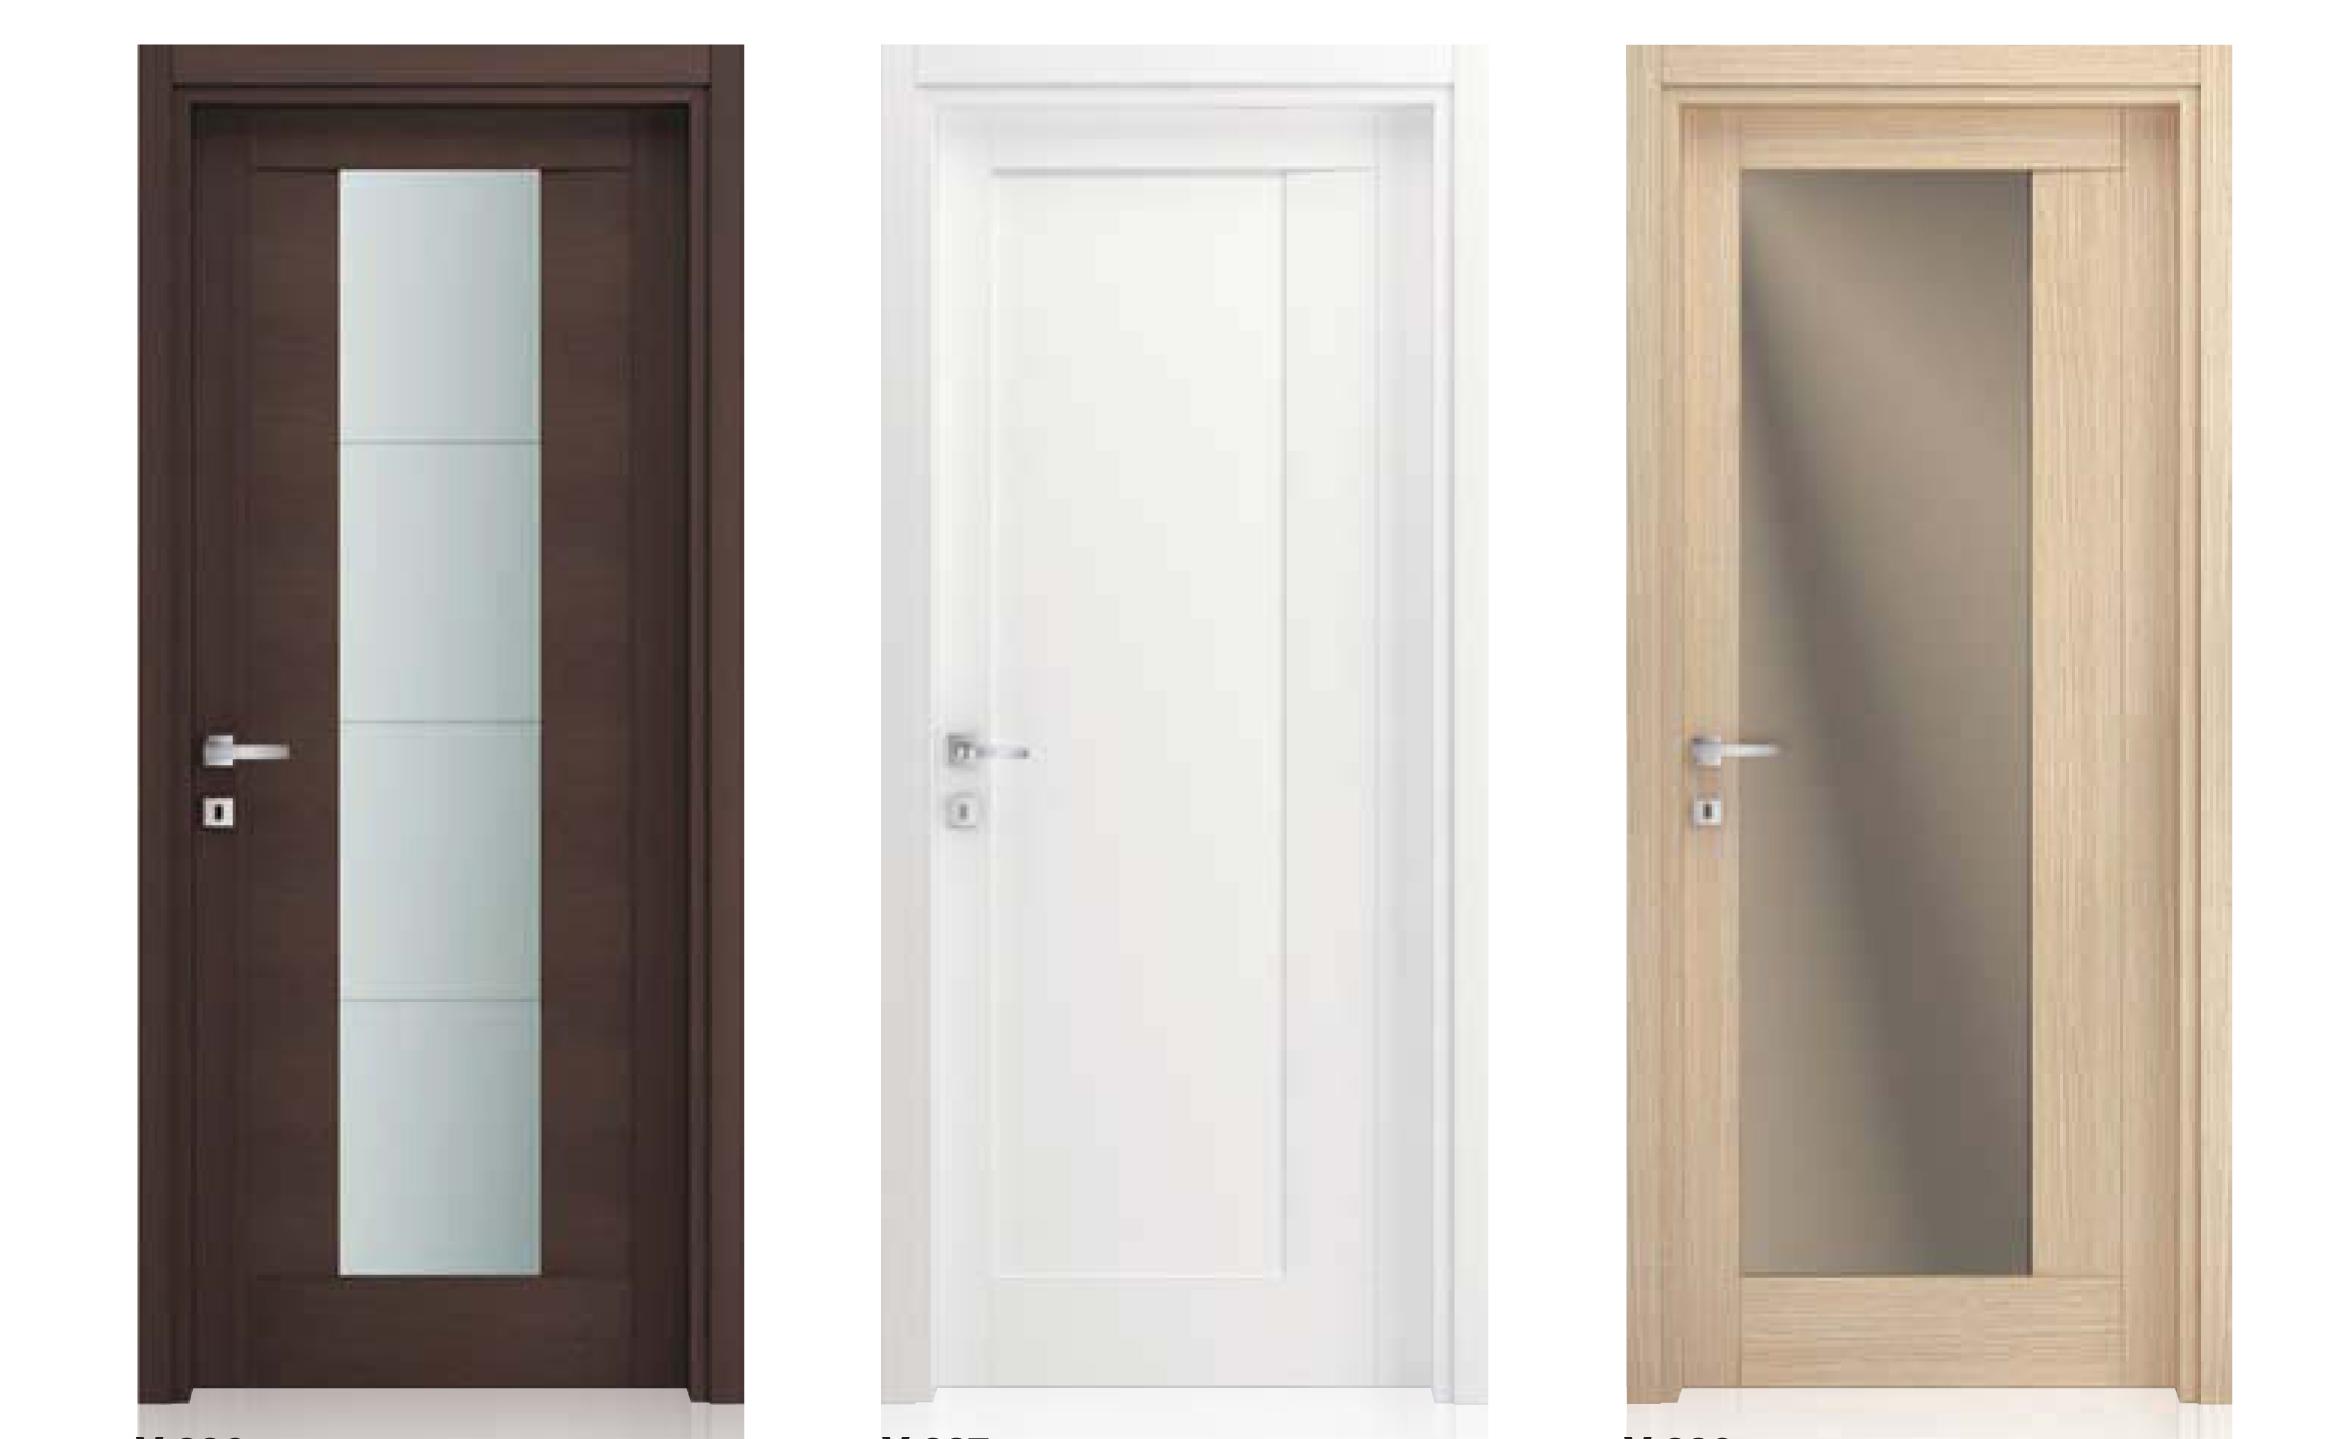 Porte interne vetro satinato porta scorrevole vetro - Porte interne obi ...